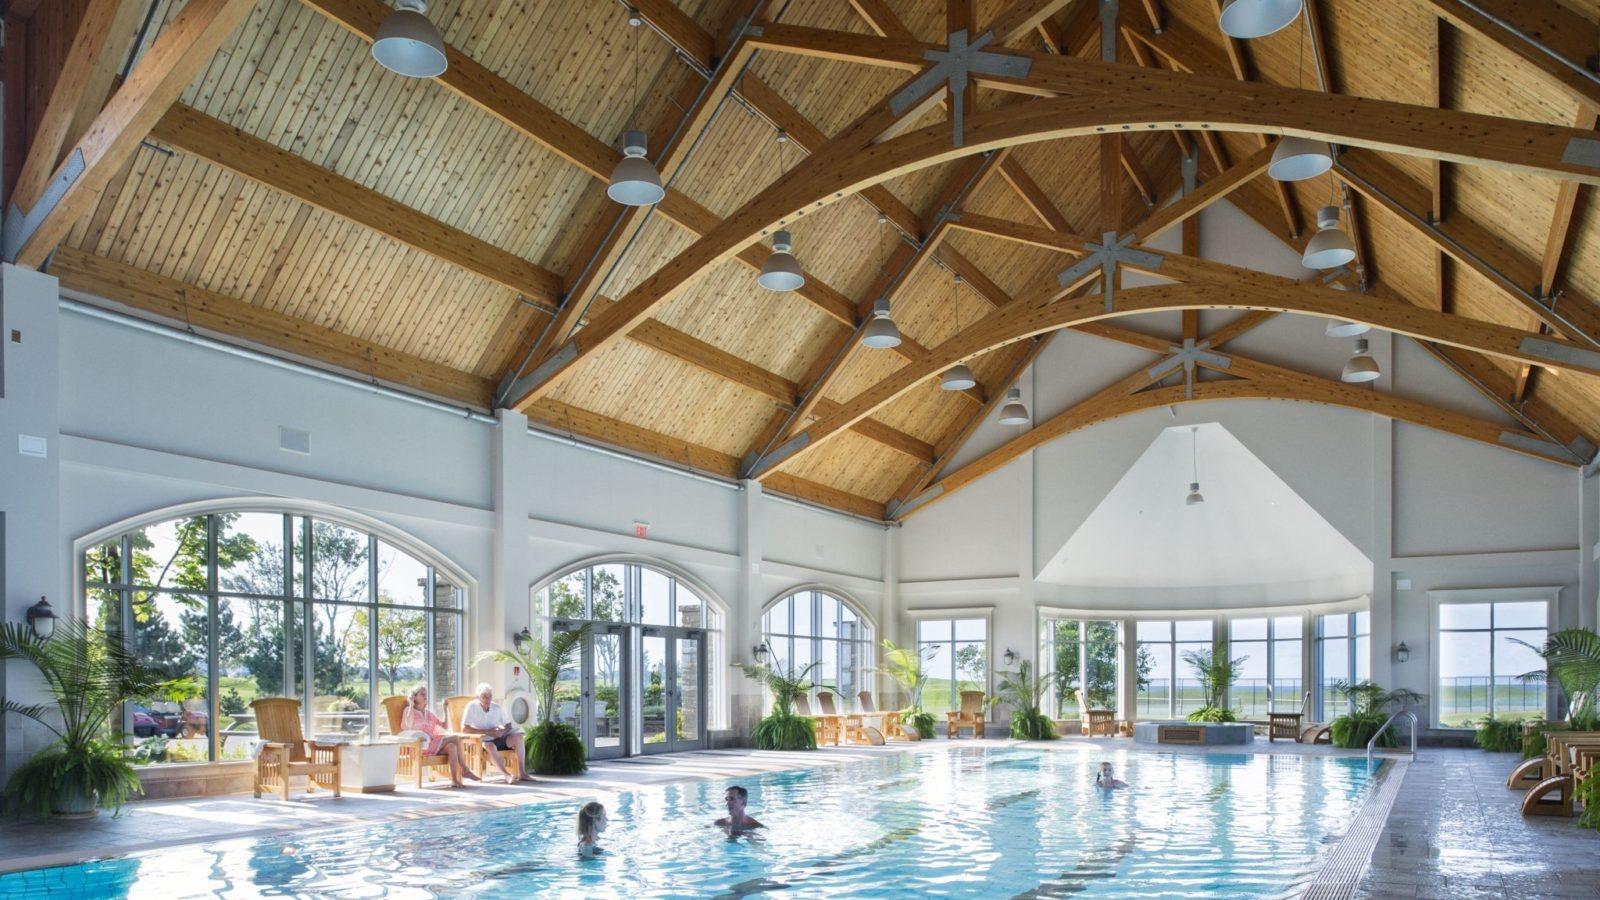 fox-harbr-resort-pool-people_39023684612_o